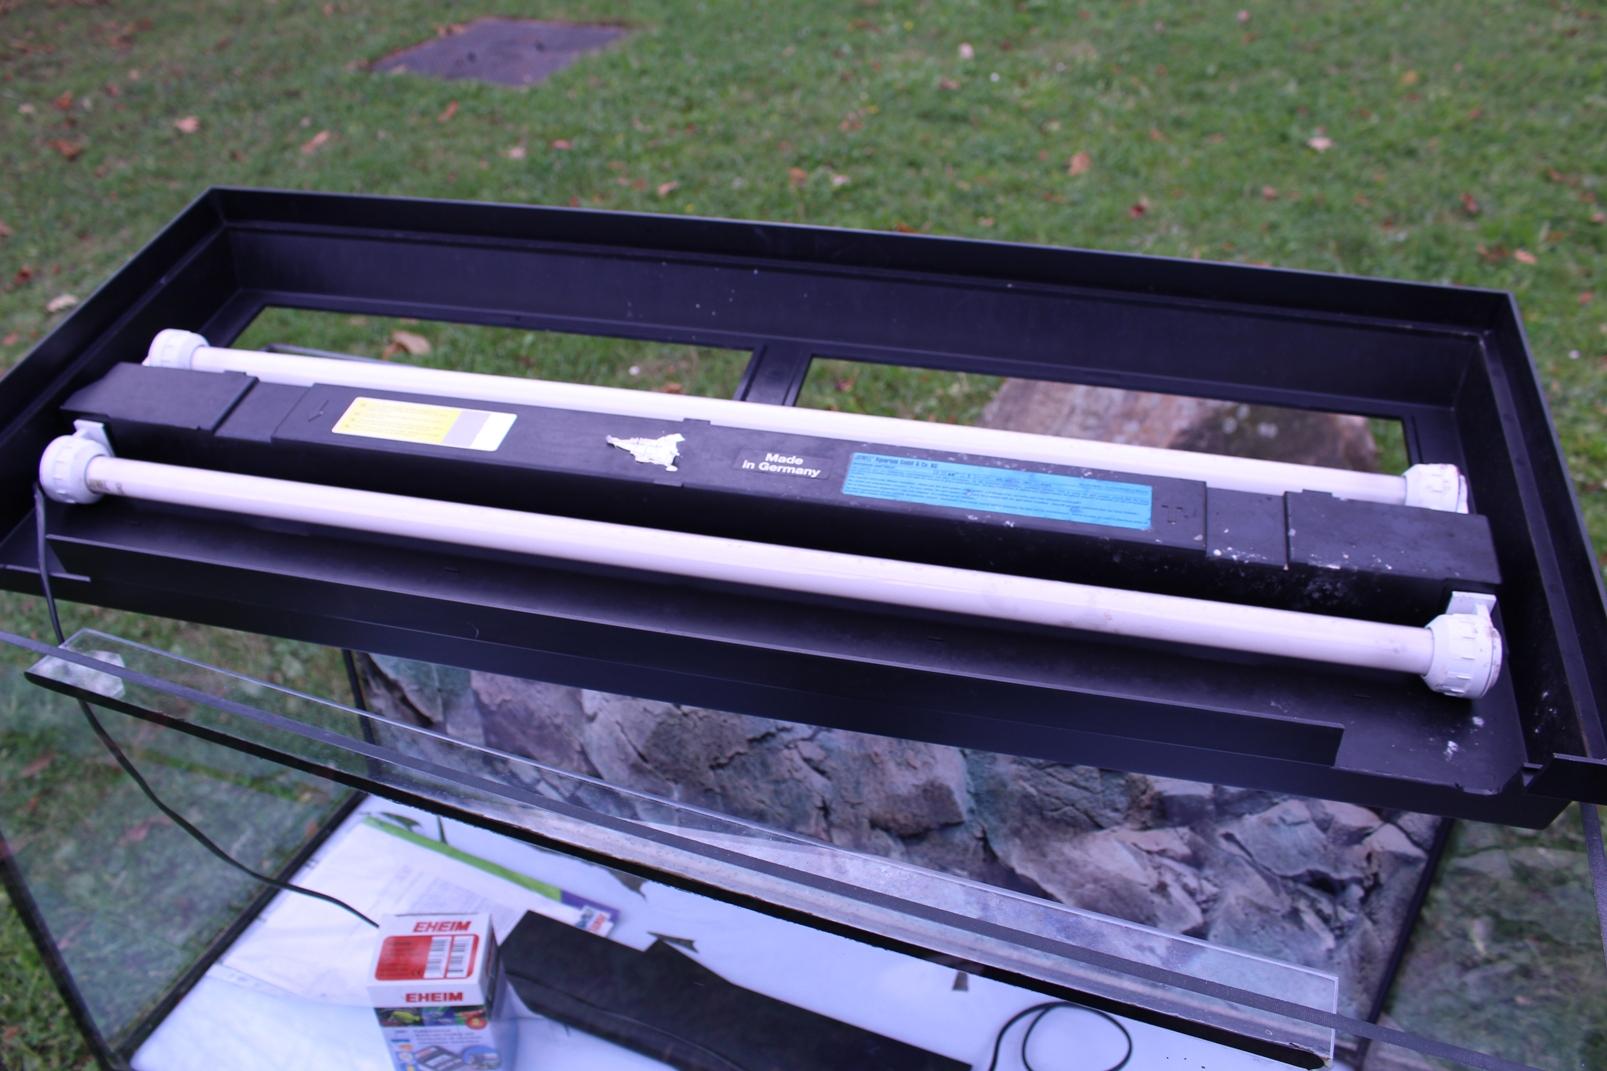 aquarium 200 liter m juwel duolux beleuchtung eheim futterautomat s wasser ebay. Black Bedroom Furniture Sets. Home Design Ideas